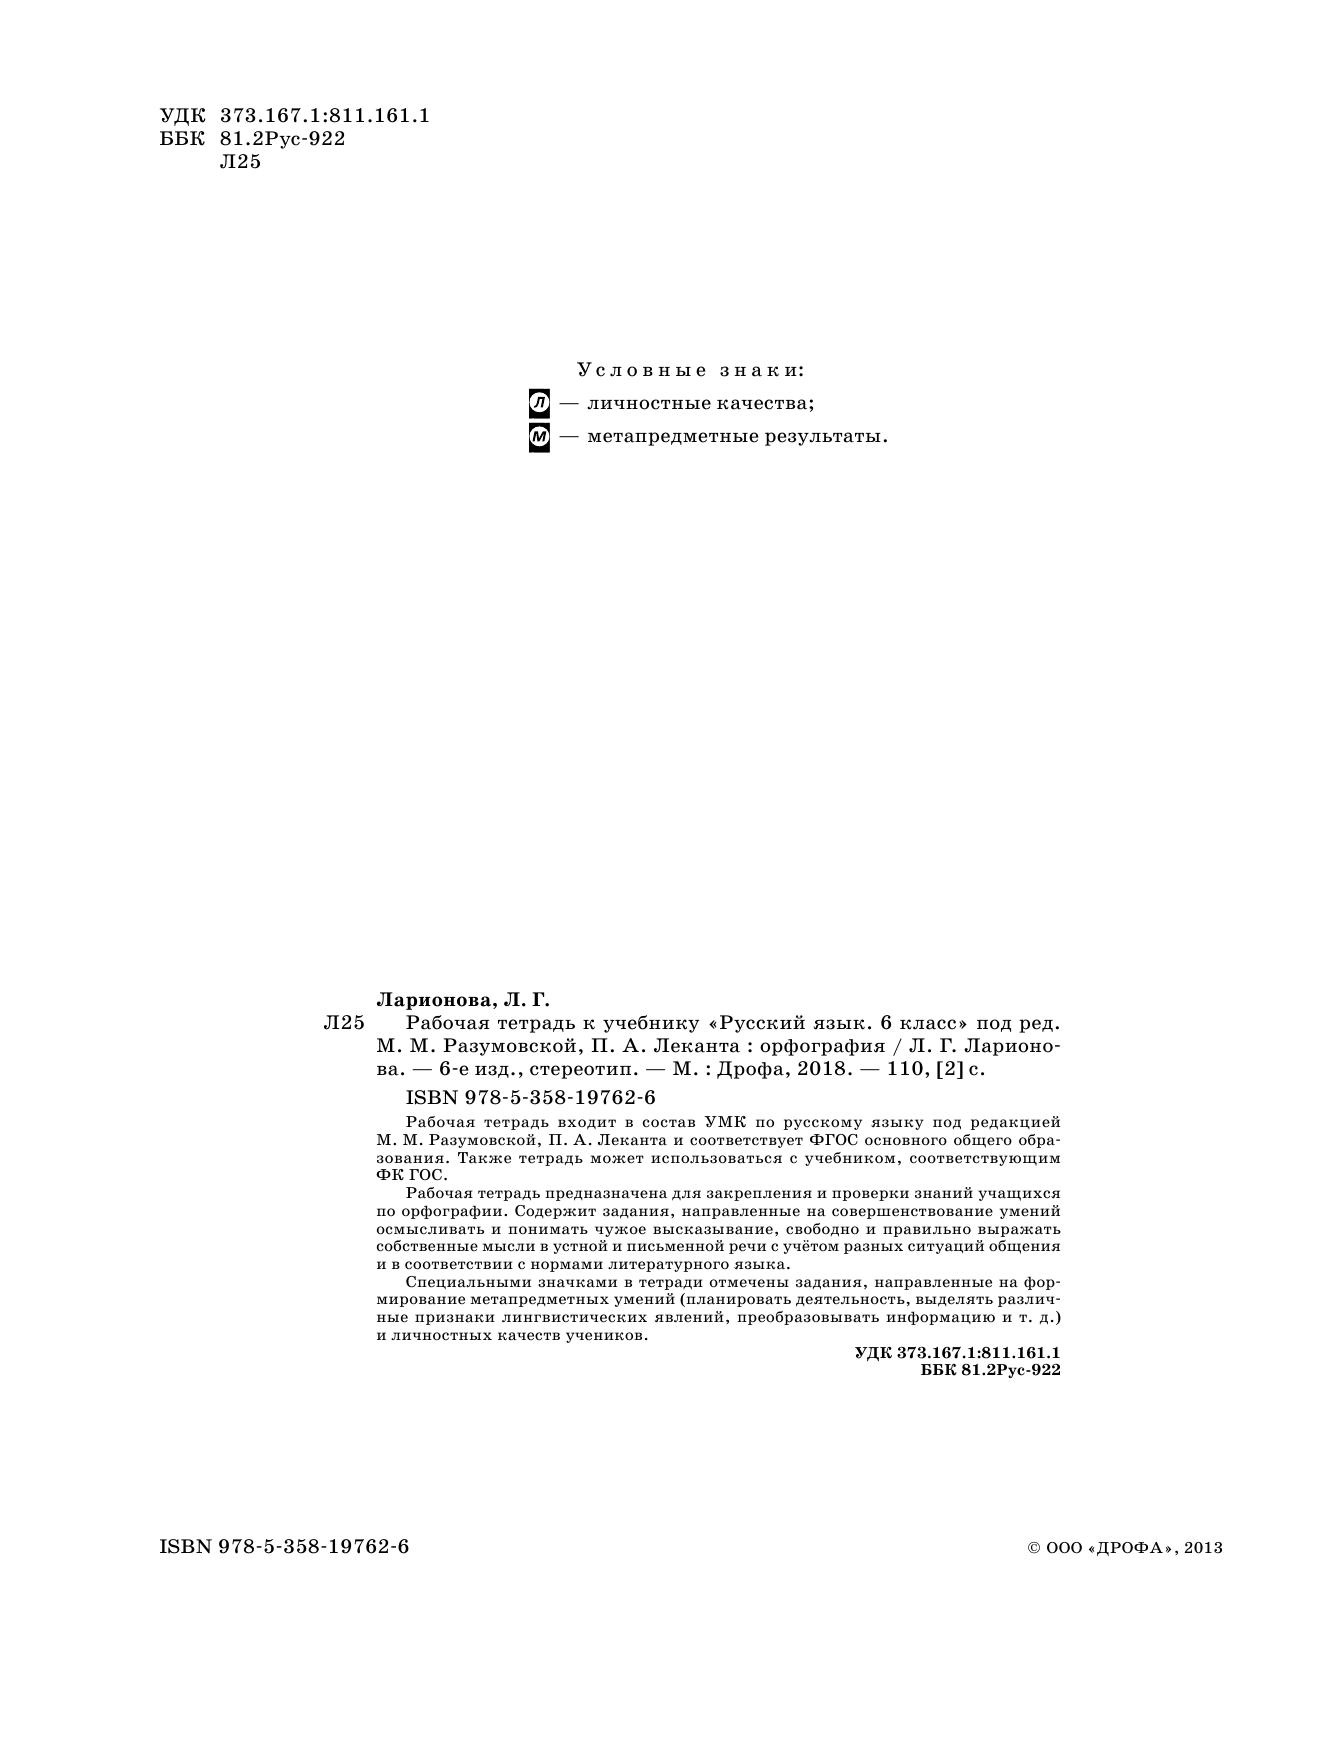 Домашняя работа по русскому языку 7 класс разумовская лекента